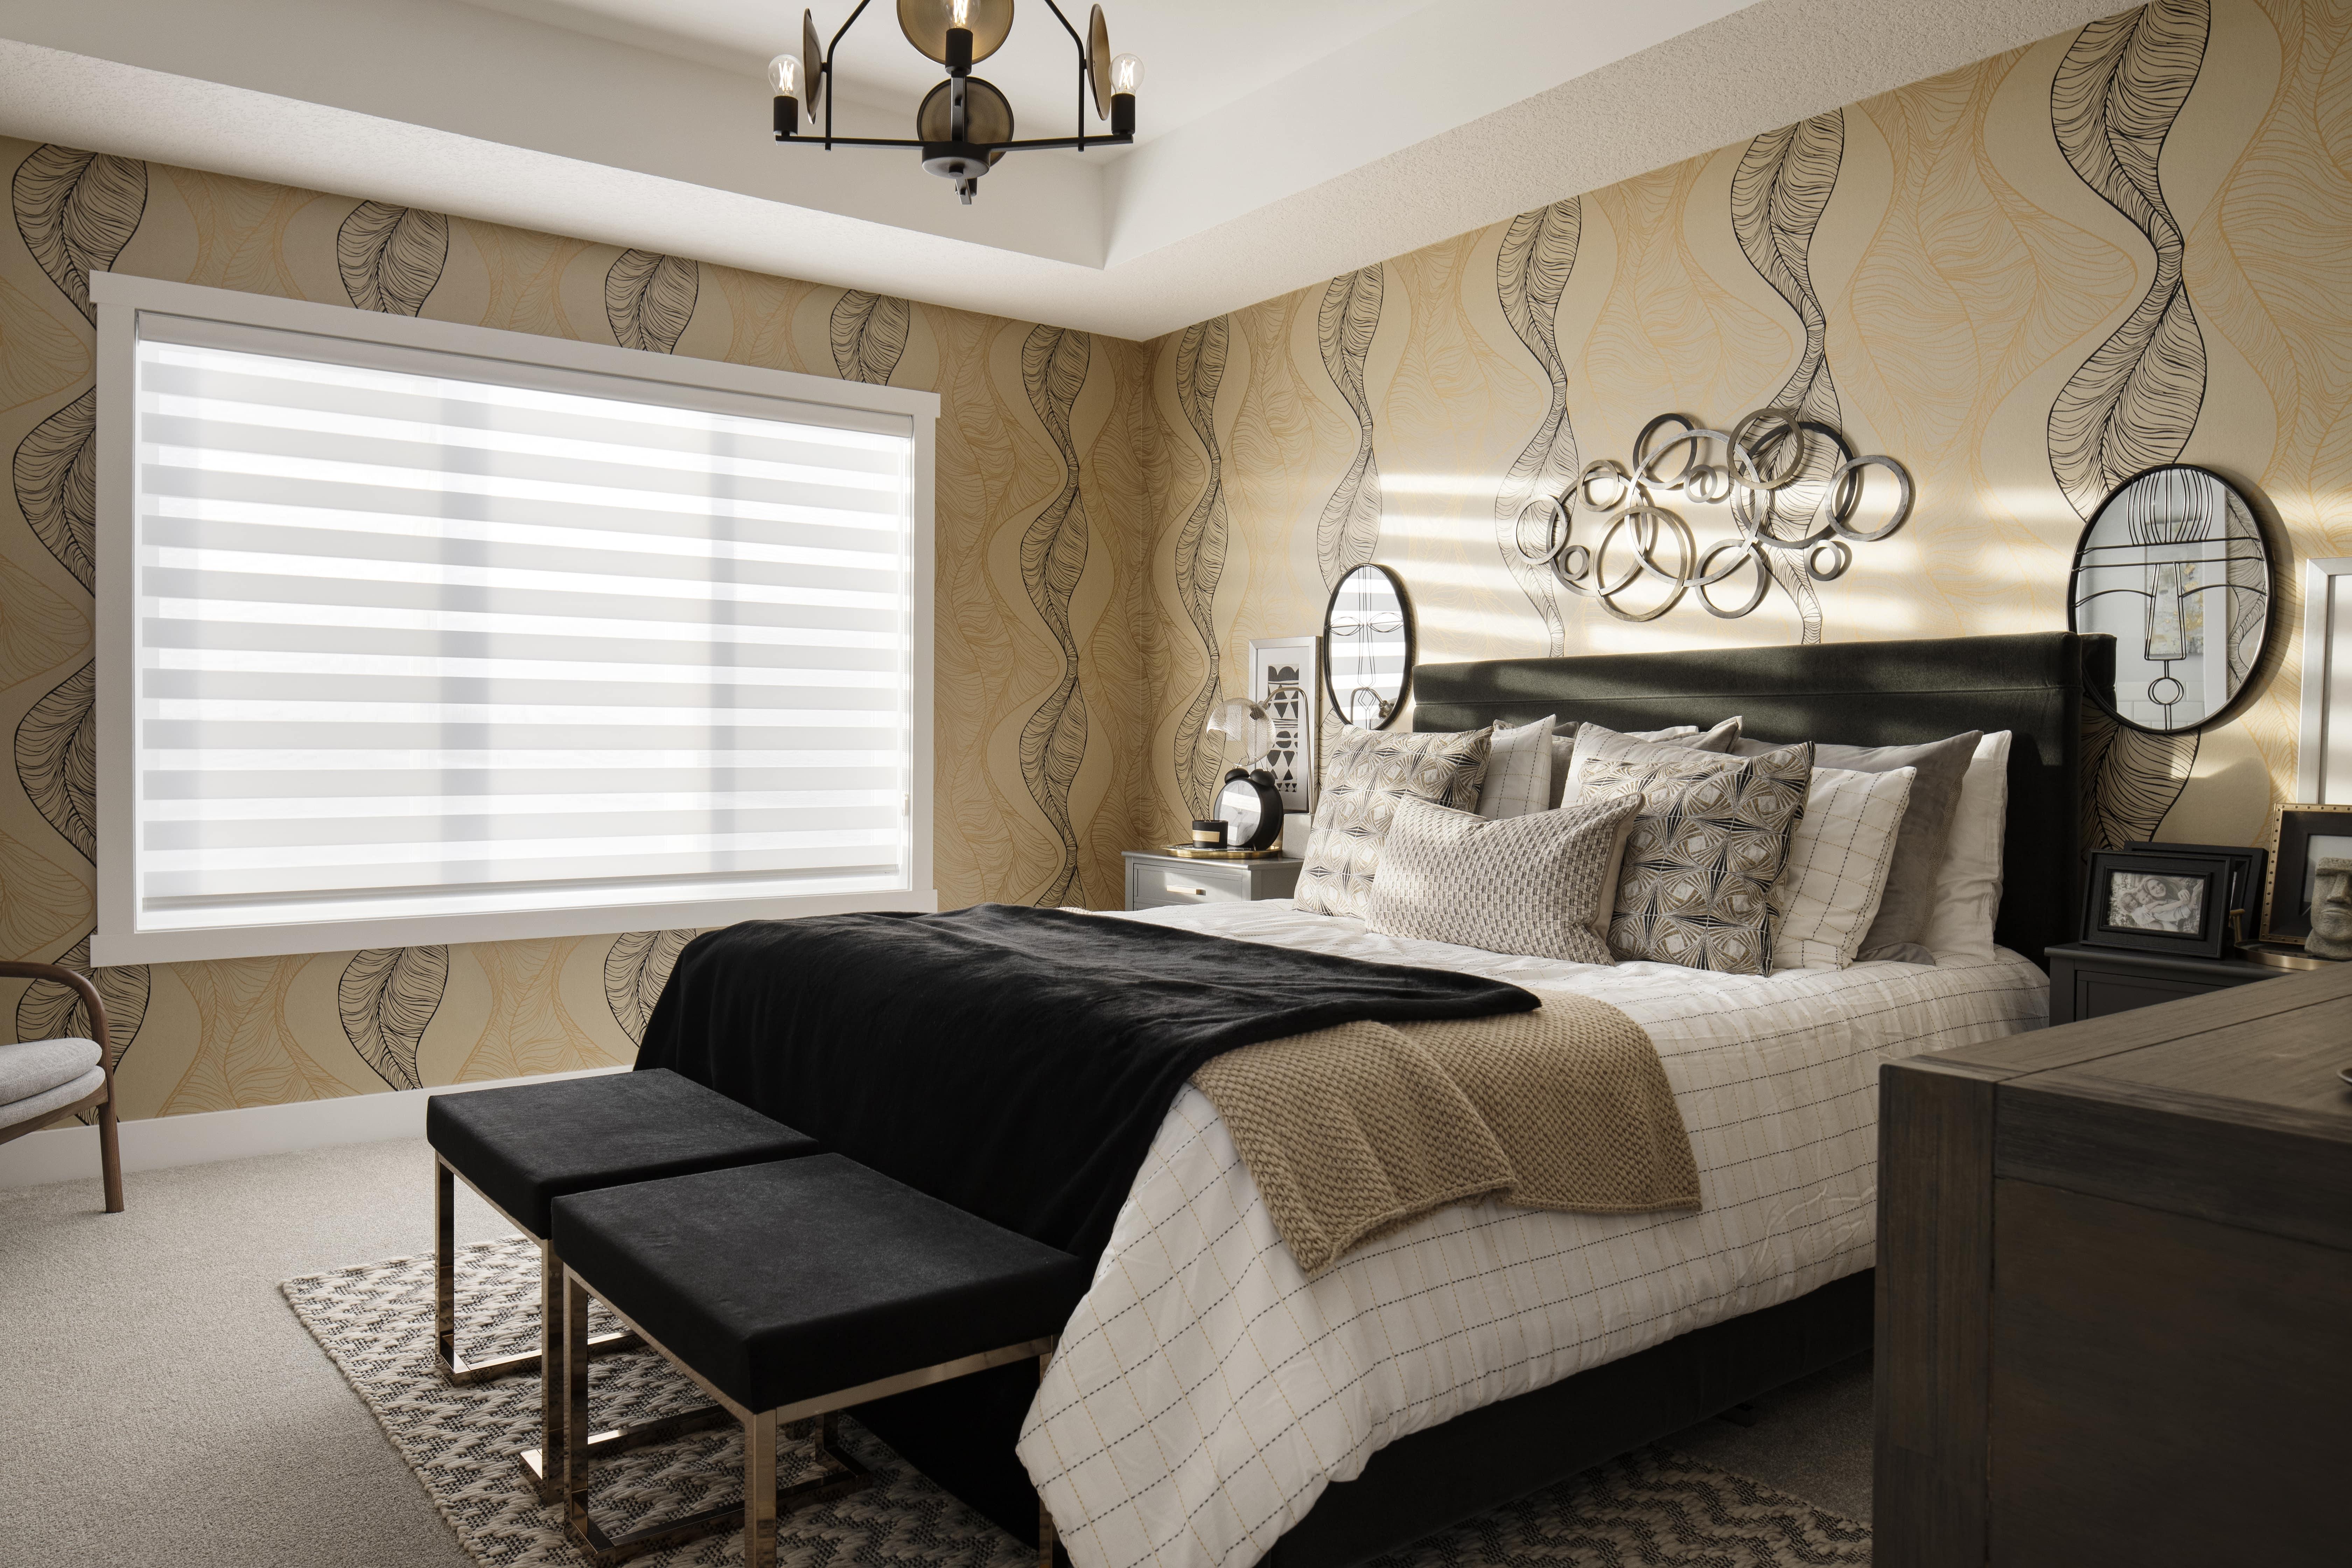 Luxuria_Homes_Builder_Calgary_Airdrie_Edmonton_Chestermere_Strathmore23-min